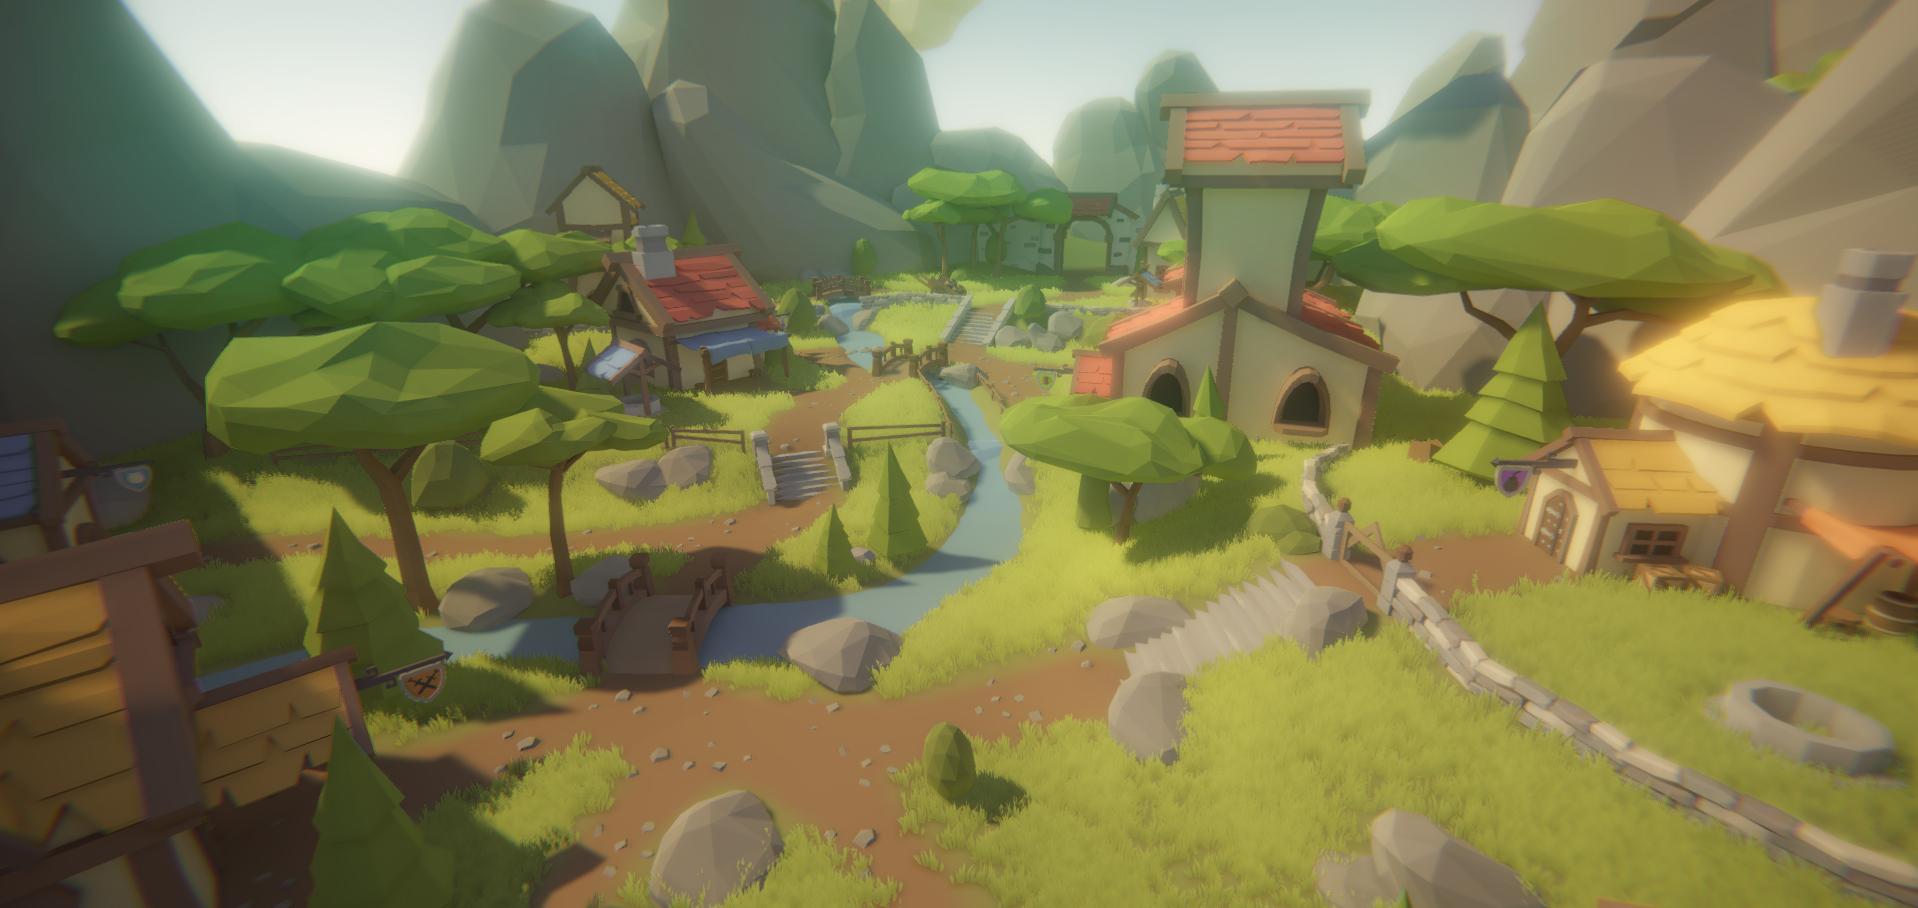 Polyscape Fantasy World A Large Modular Stylized Low